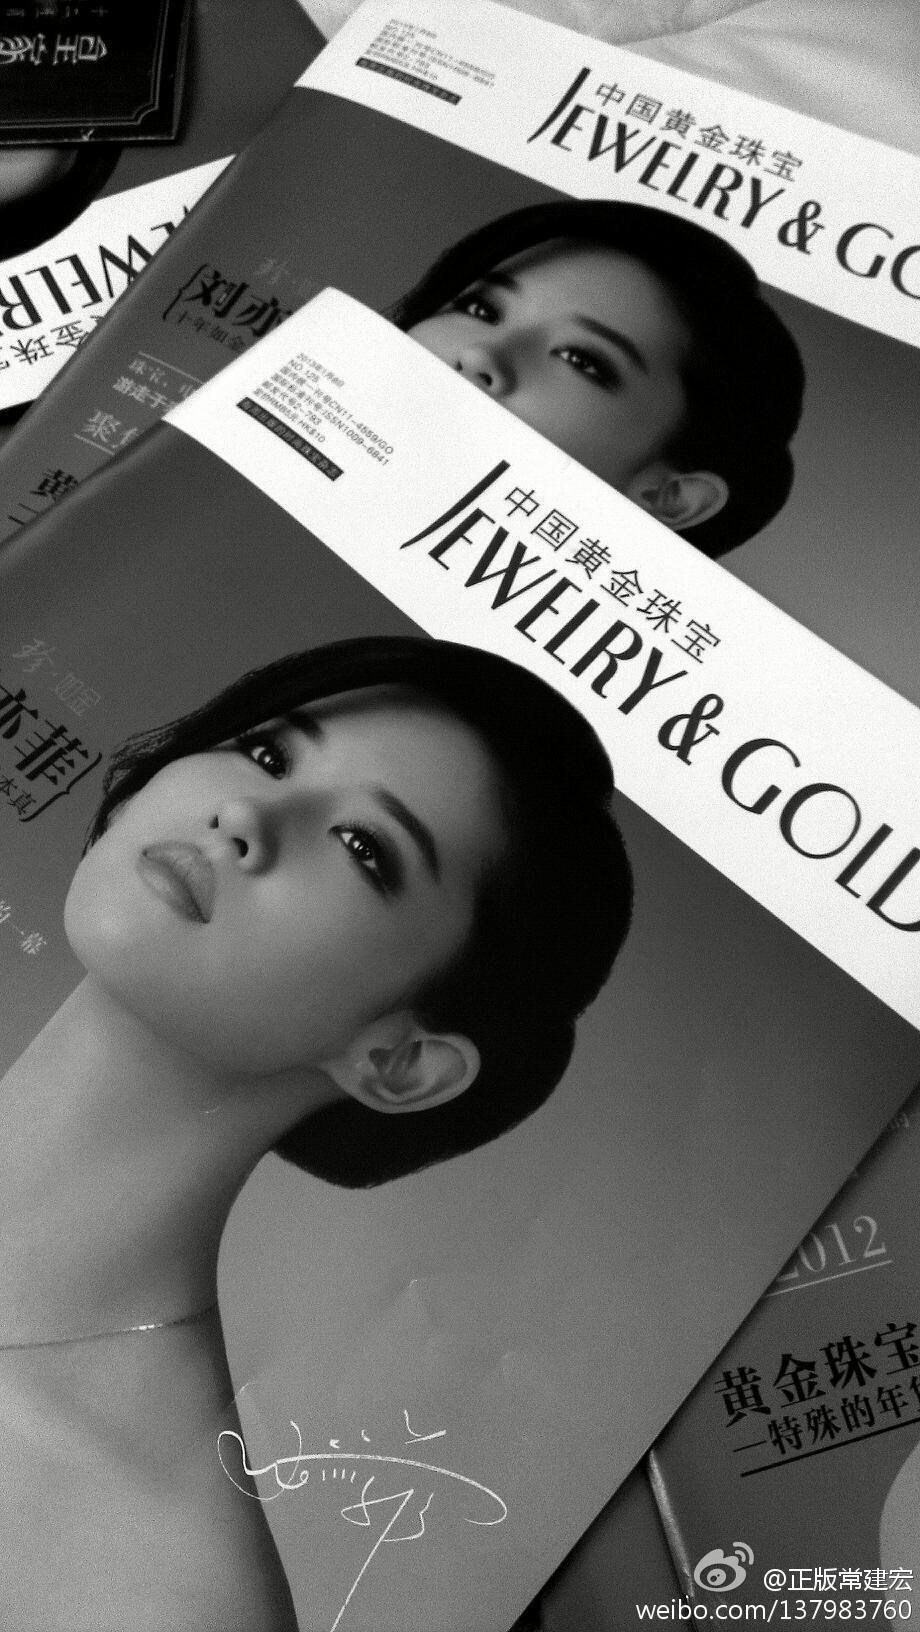 China Gold 6171559ajw1e0me9dfex2j